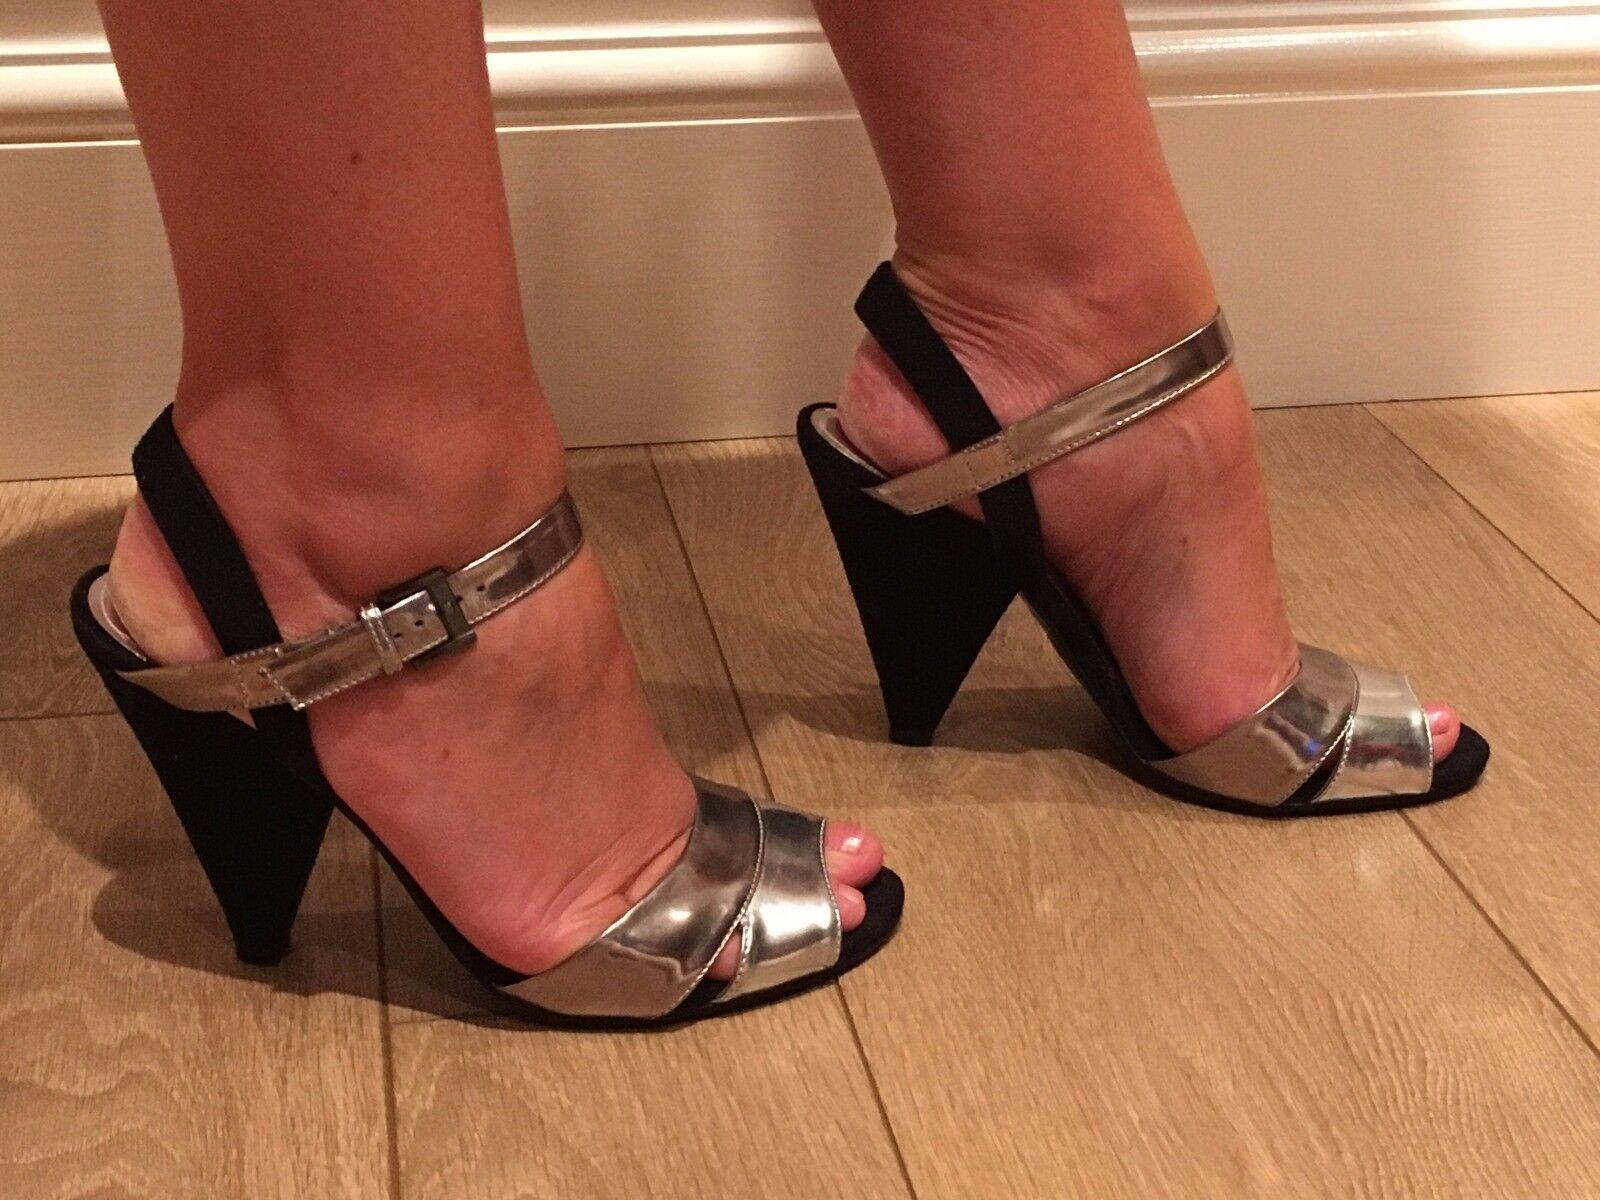 Women's Next Size 6 Silver + Black Heels Good Condition